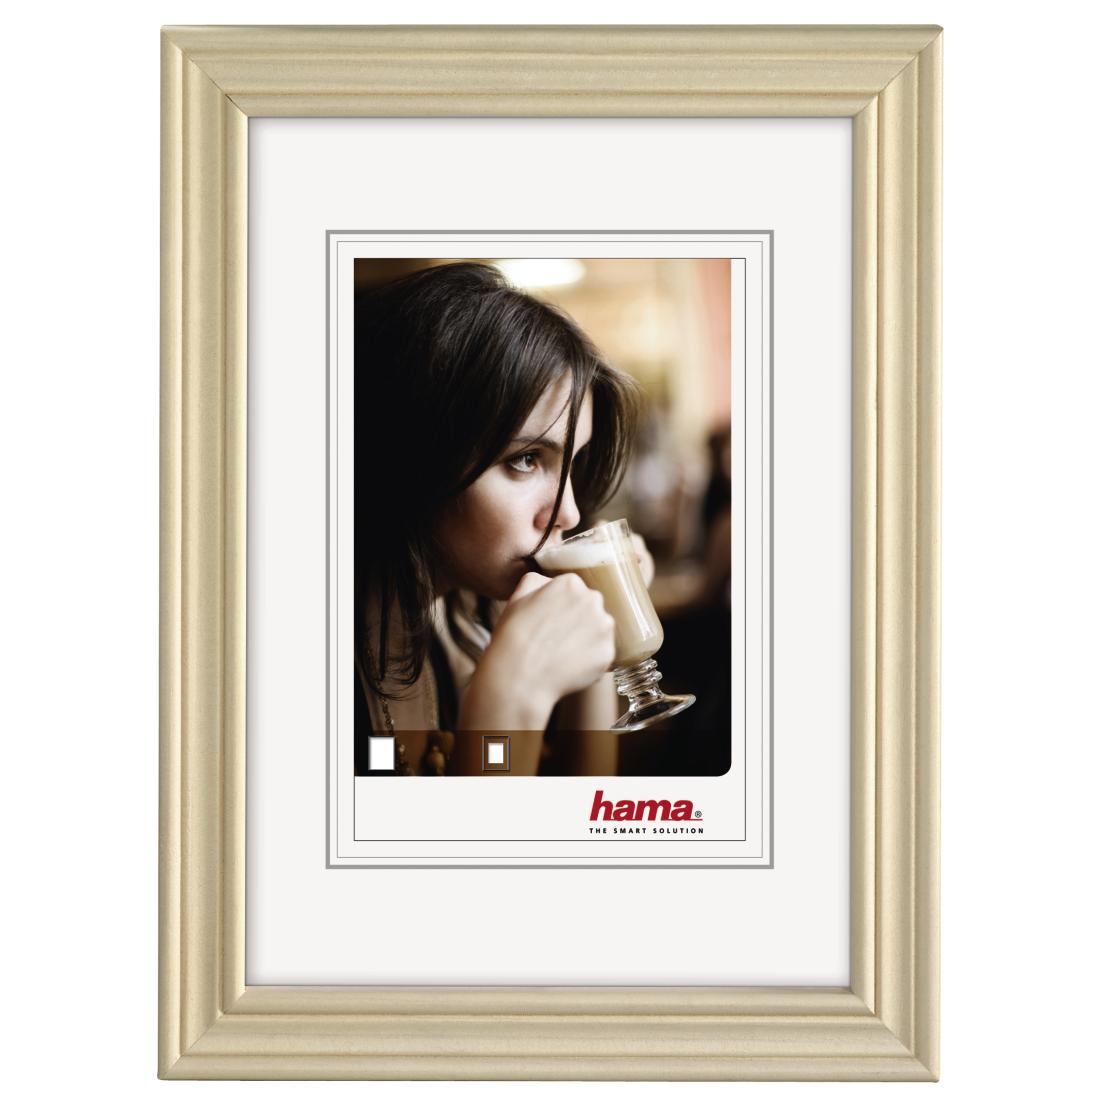 hama.com | 00100324 Hama Holzrahmen \